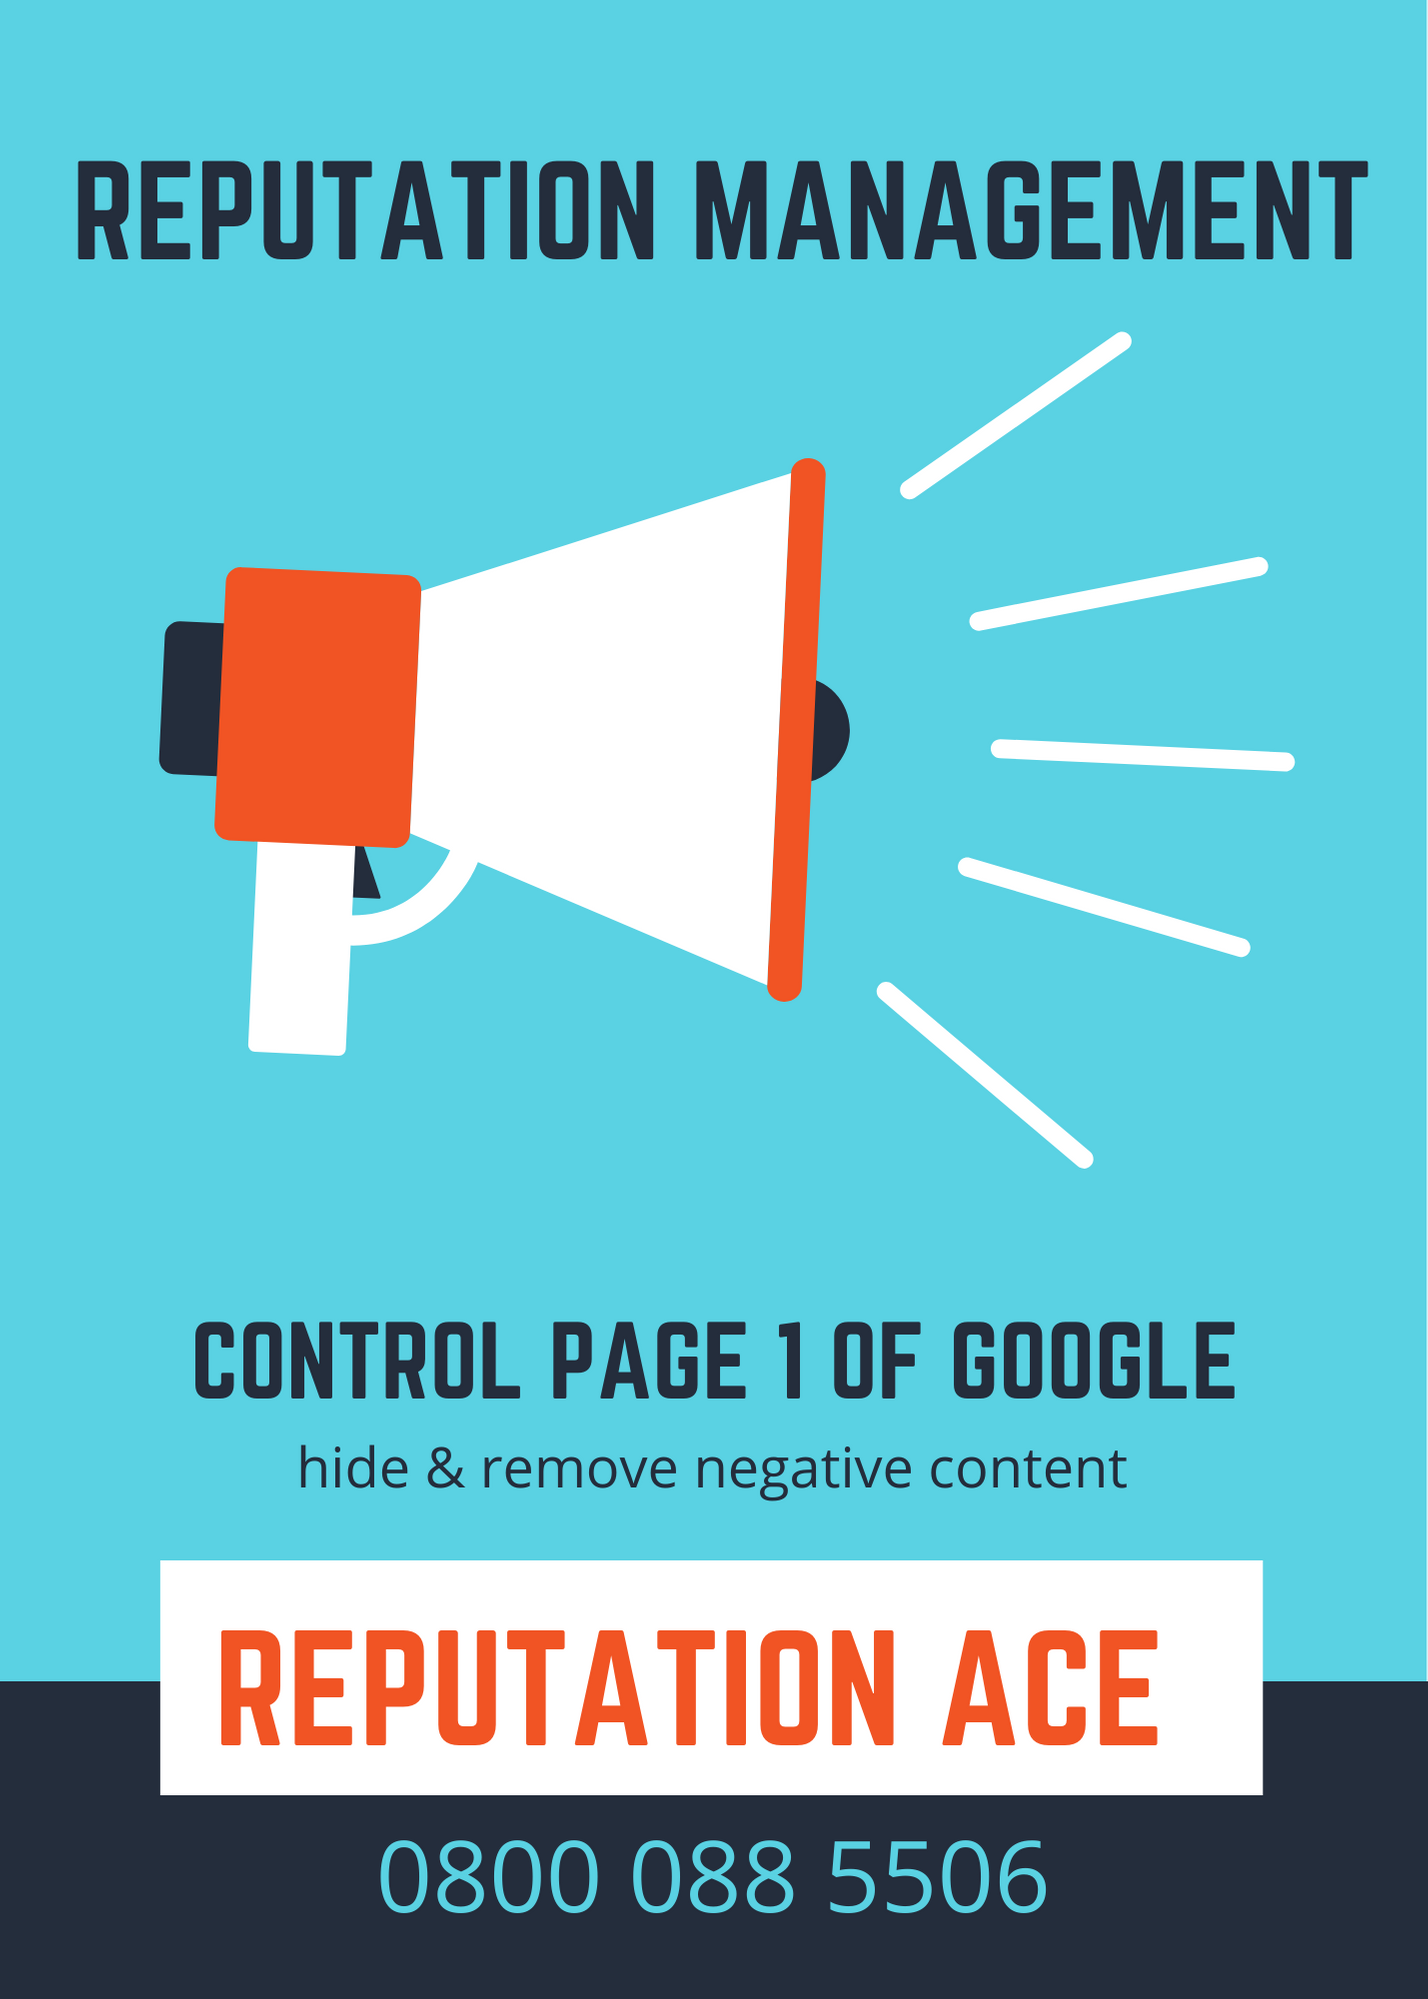 reputation ace reputation management services uk 0800 088 5506